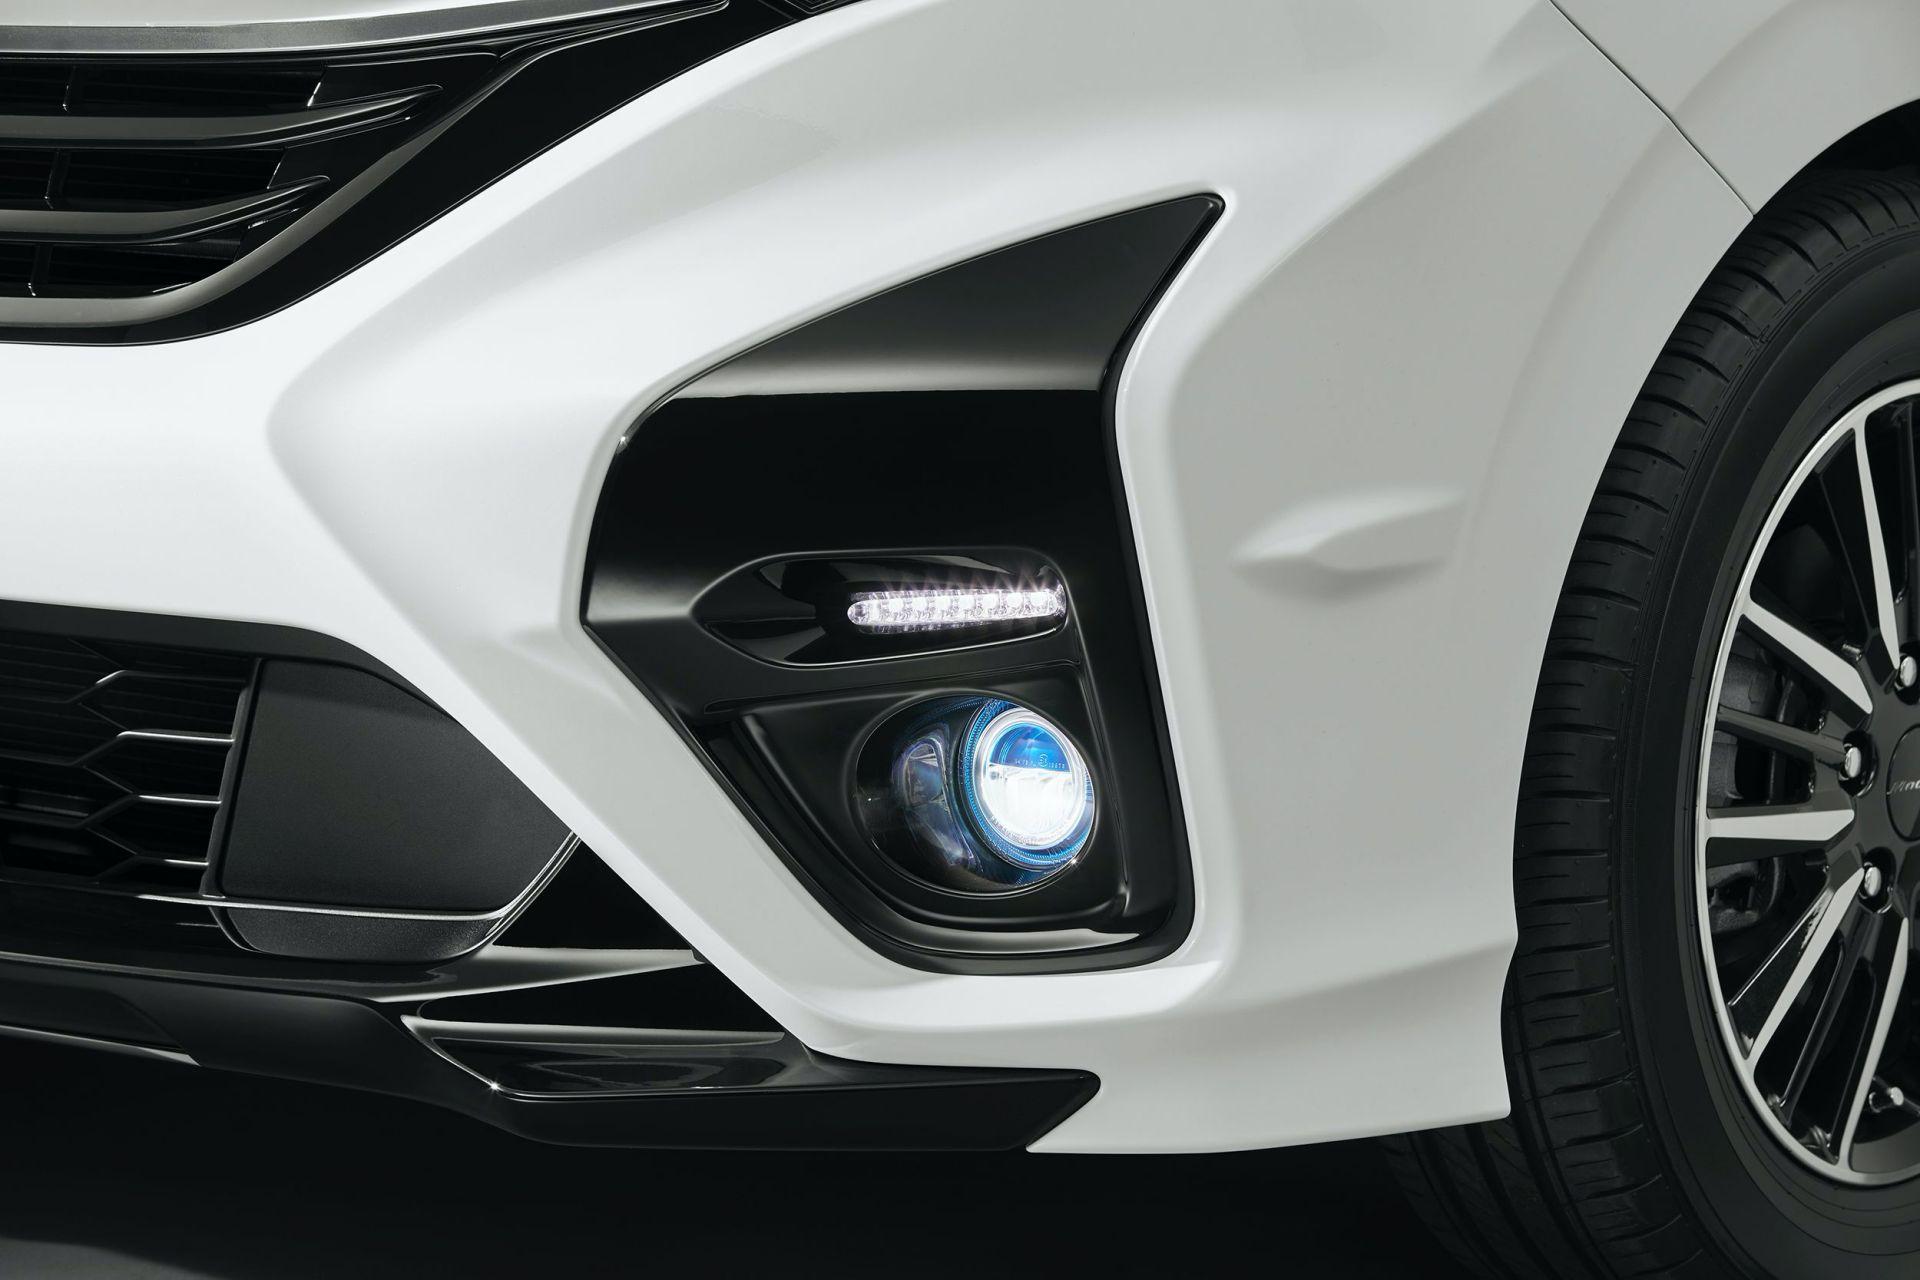 Honda-Freed-Modulo-X-Facelift-2020-37